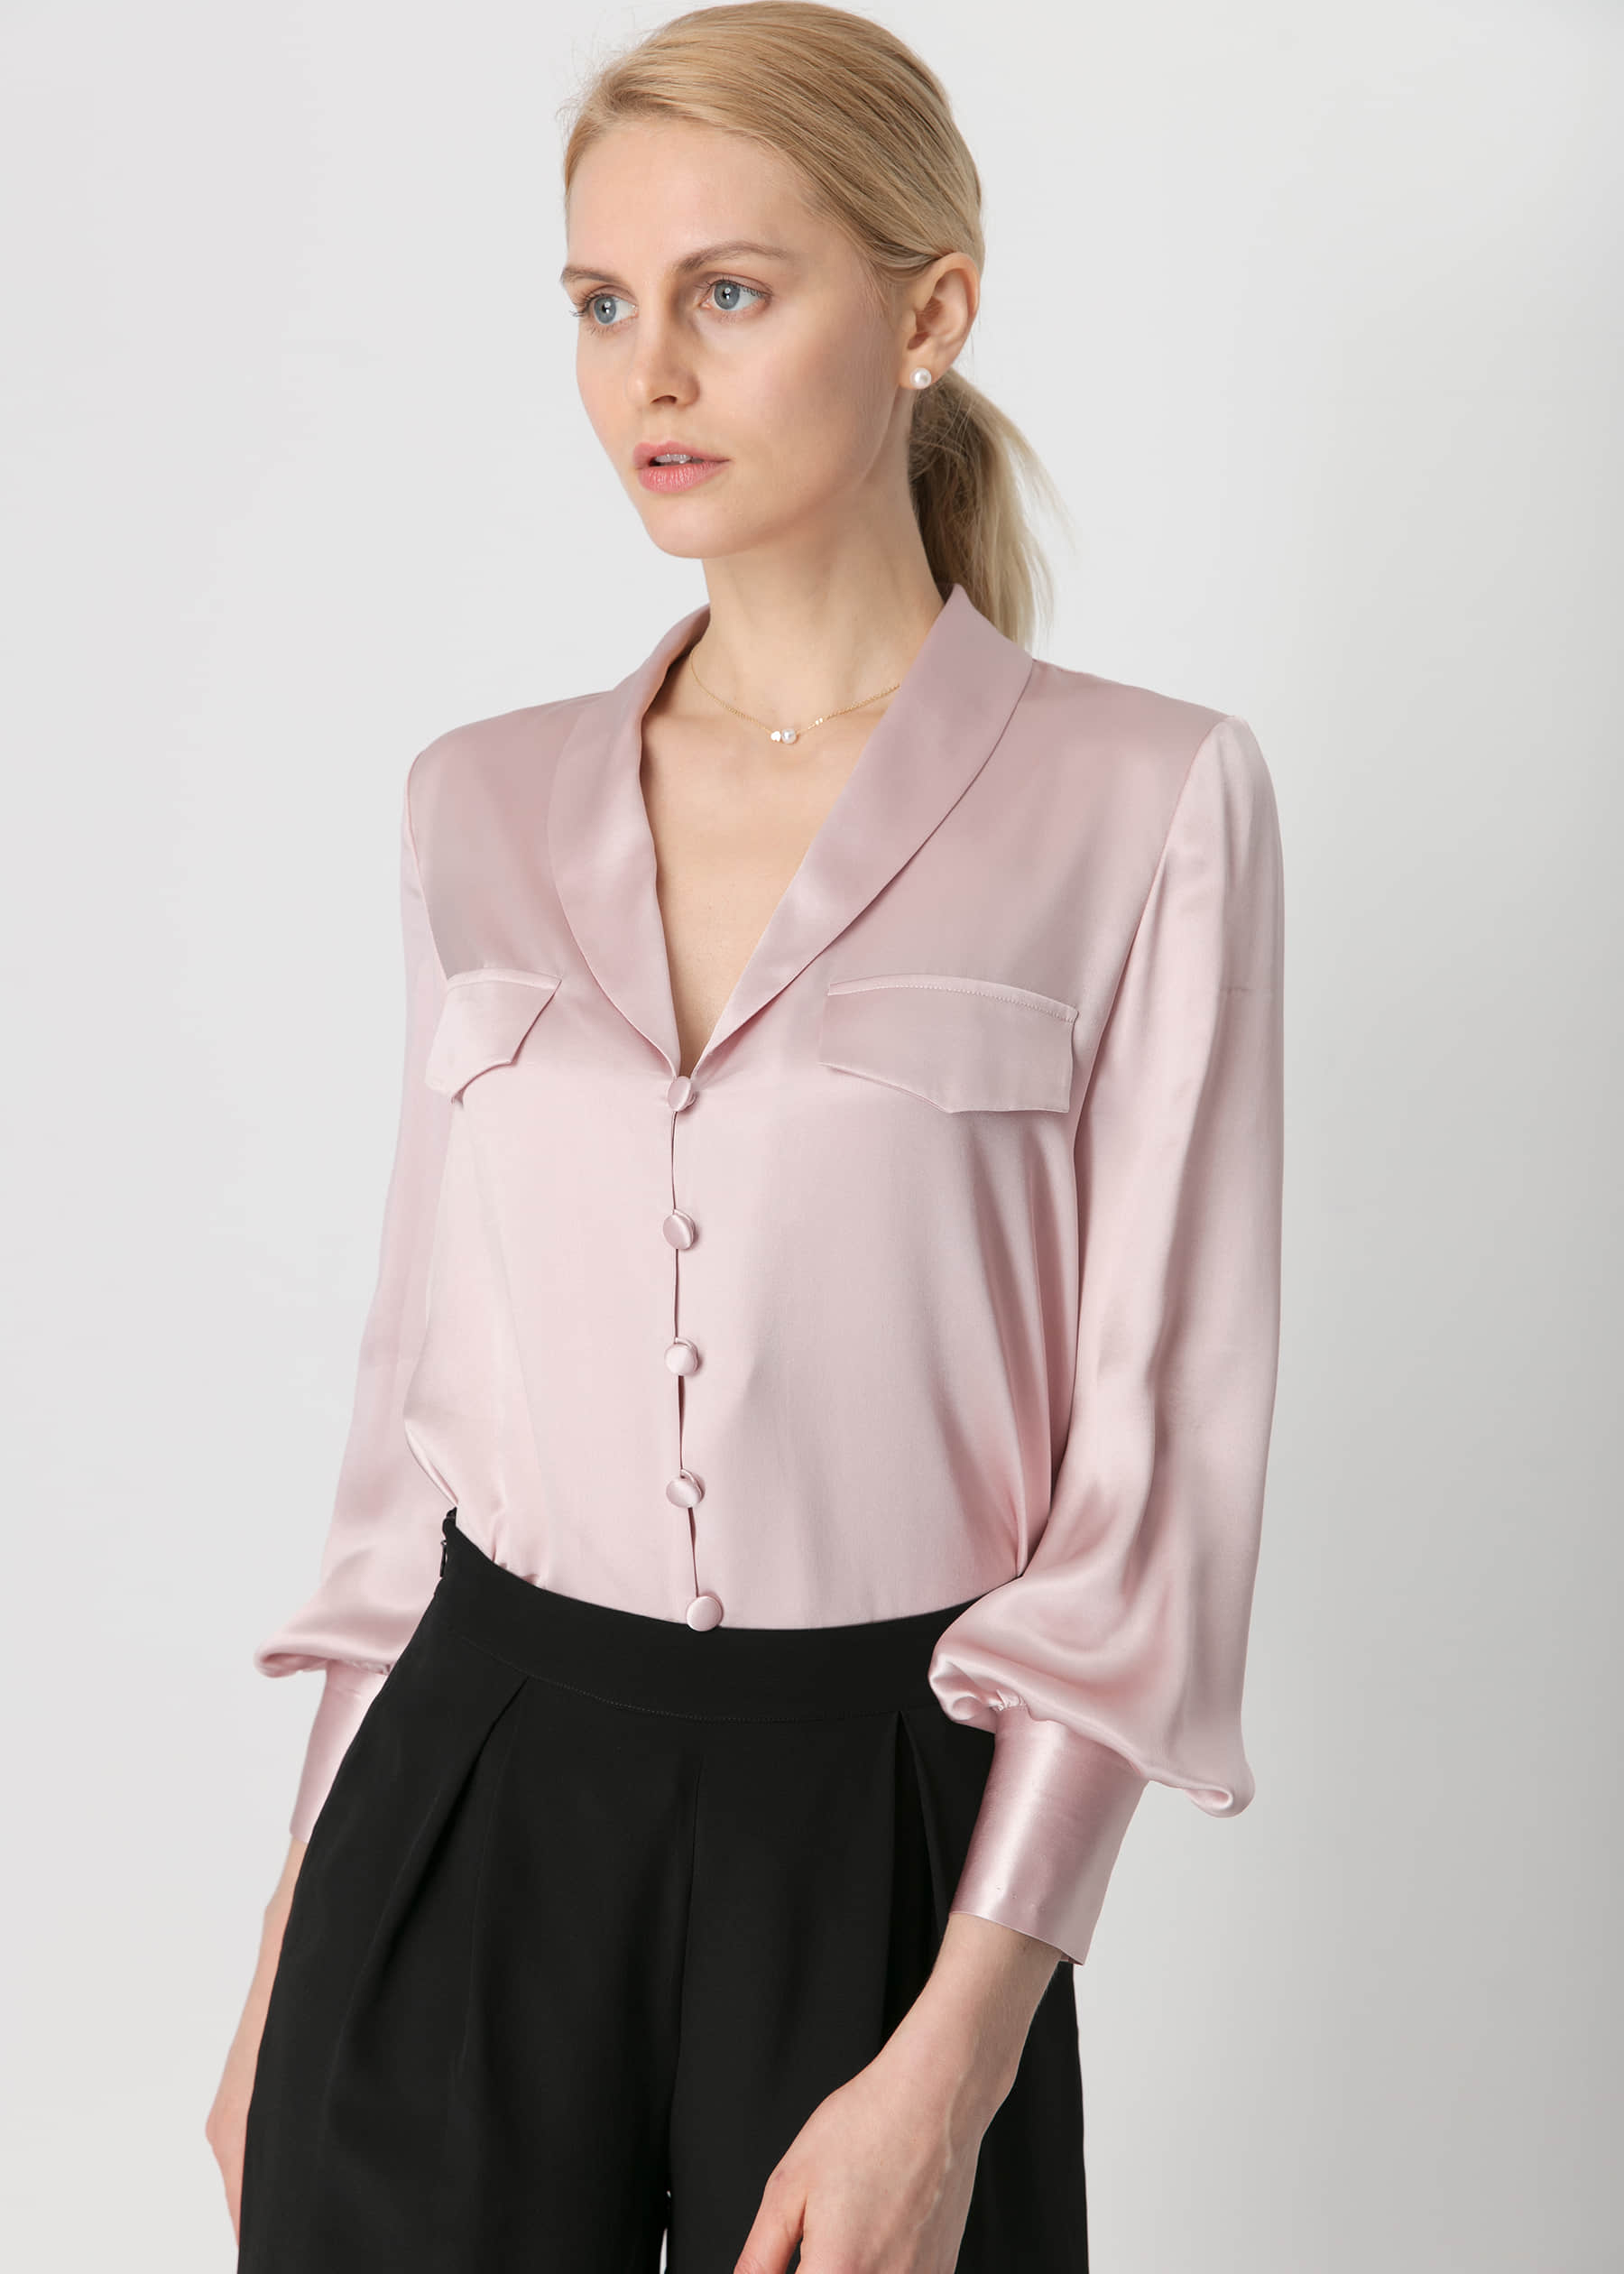 White Tie V Neck 22mm Silk Shirt Hot Sale On Lilysilk